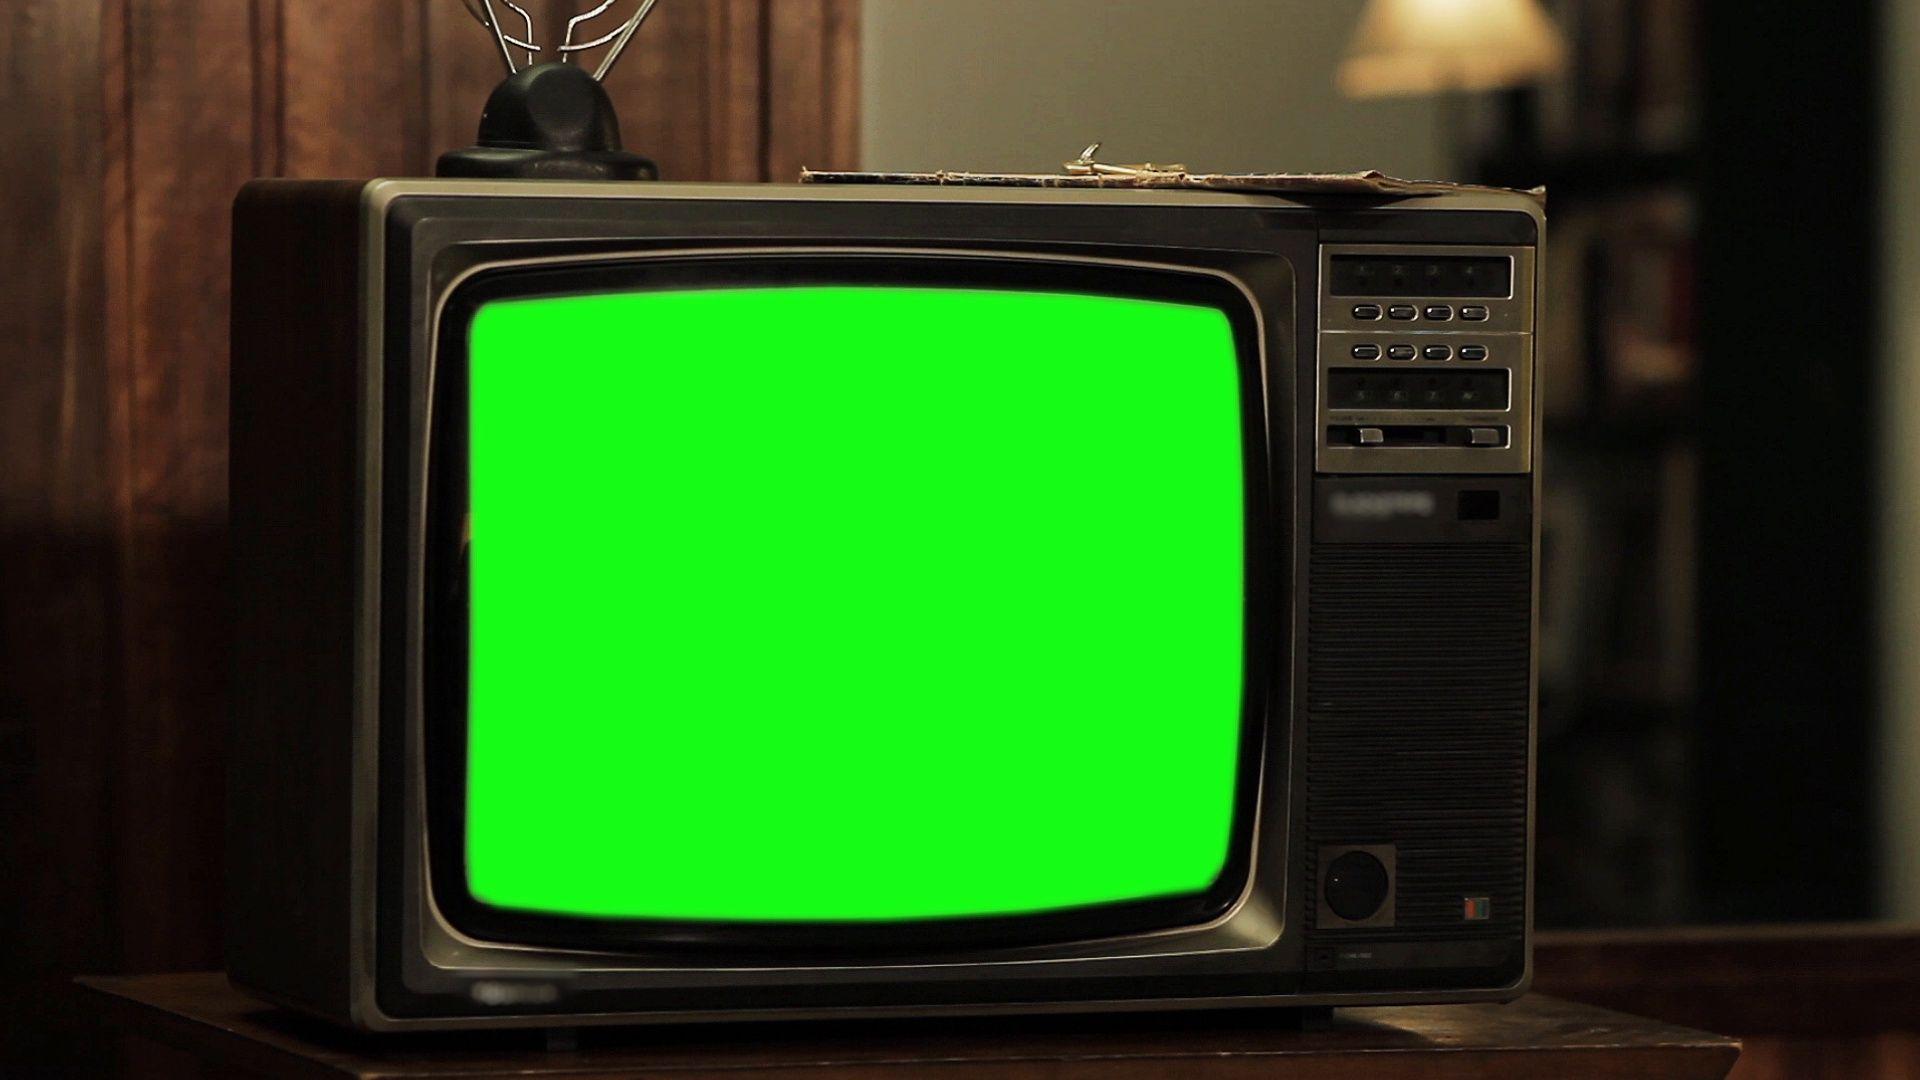 Old Tv Green Screen, CloseUp. Stock Footage,ScreenGreen